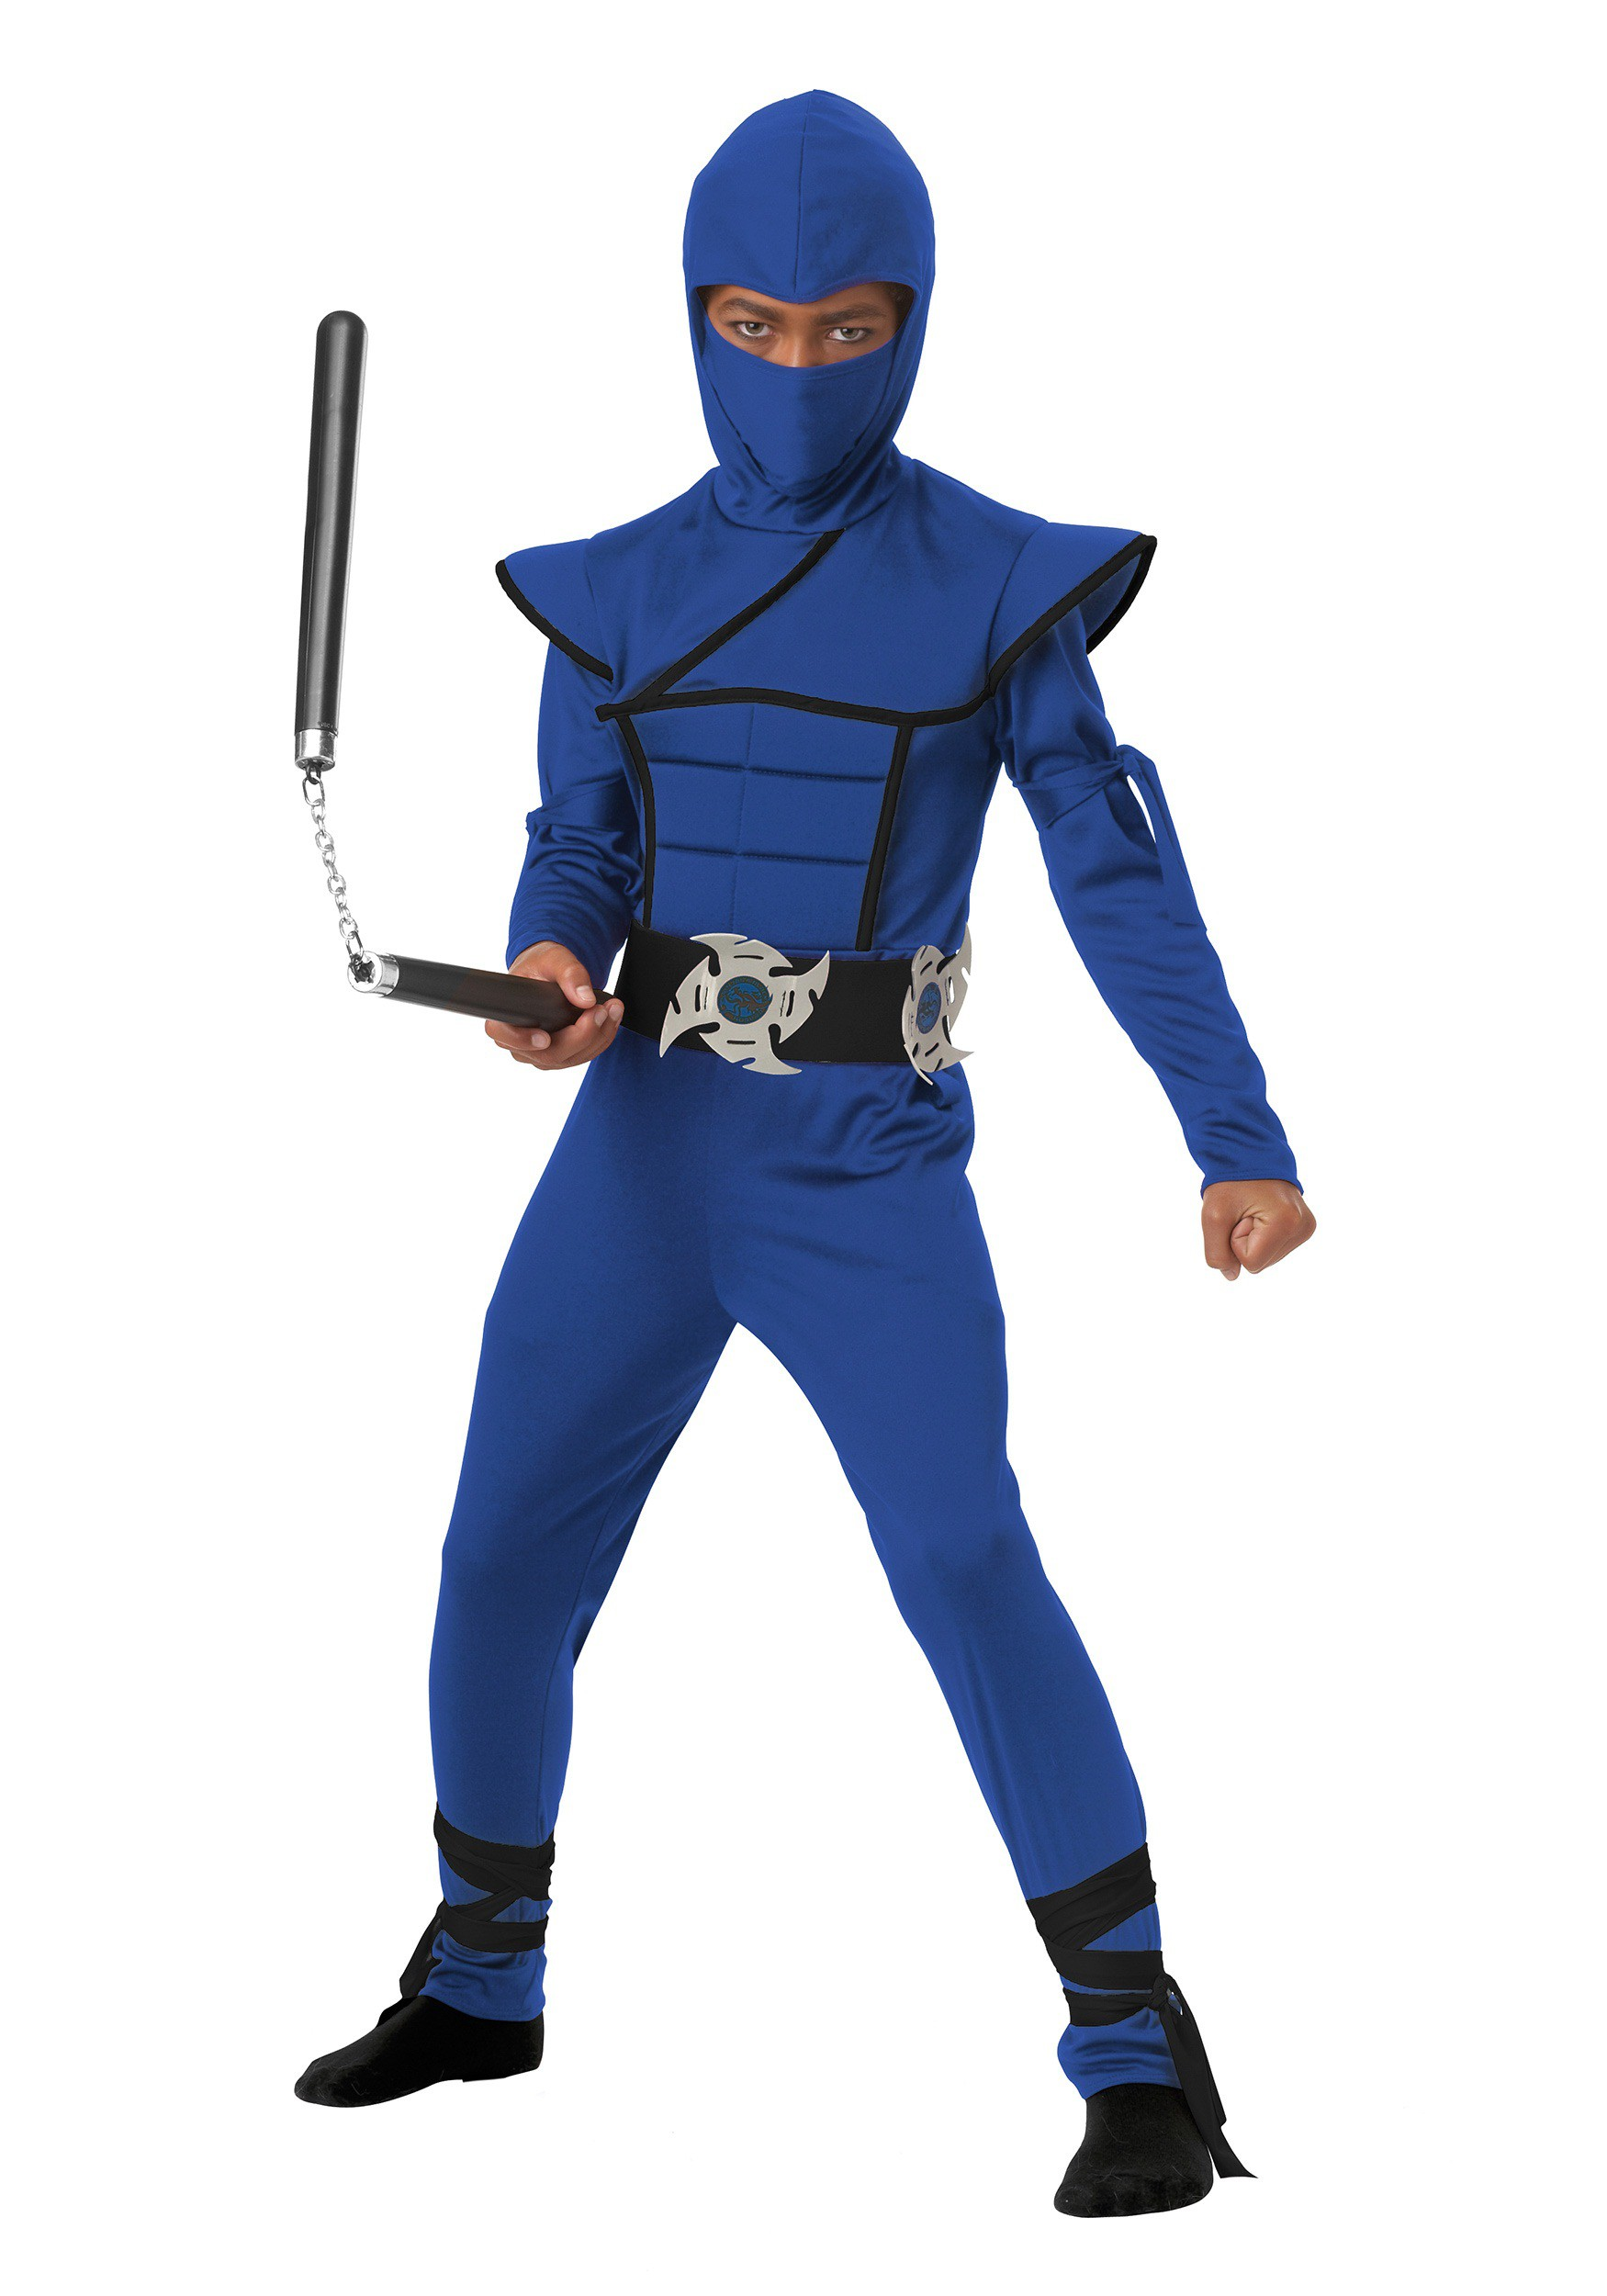 Blue Ninja Mask Free Coloring